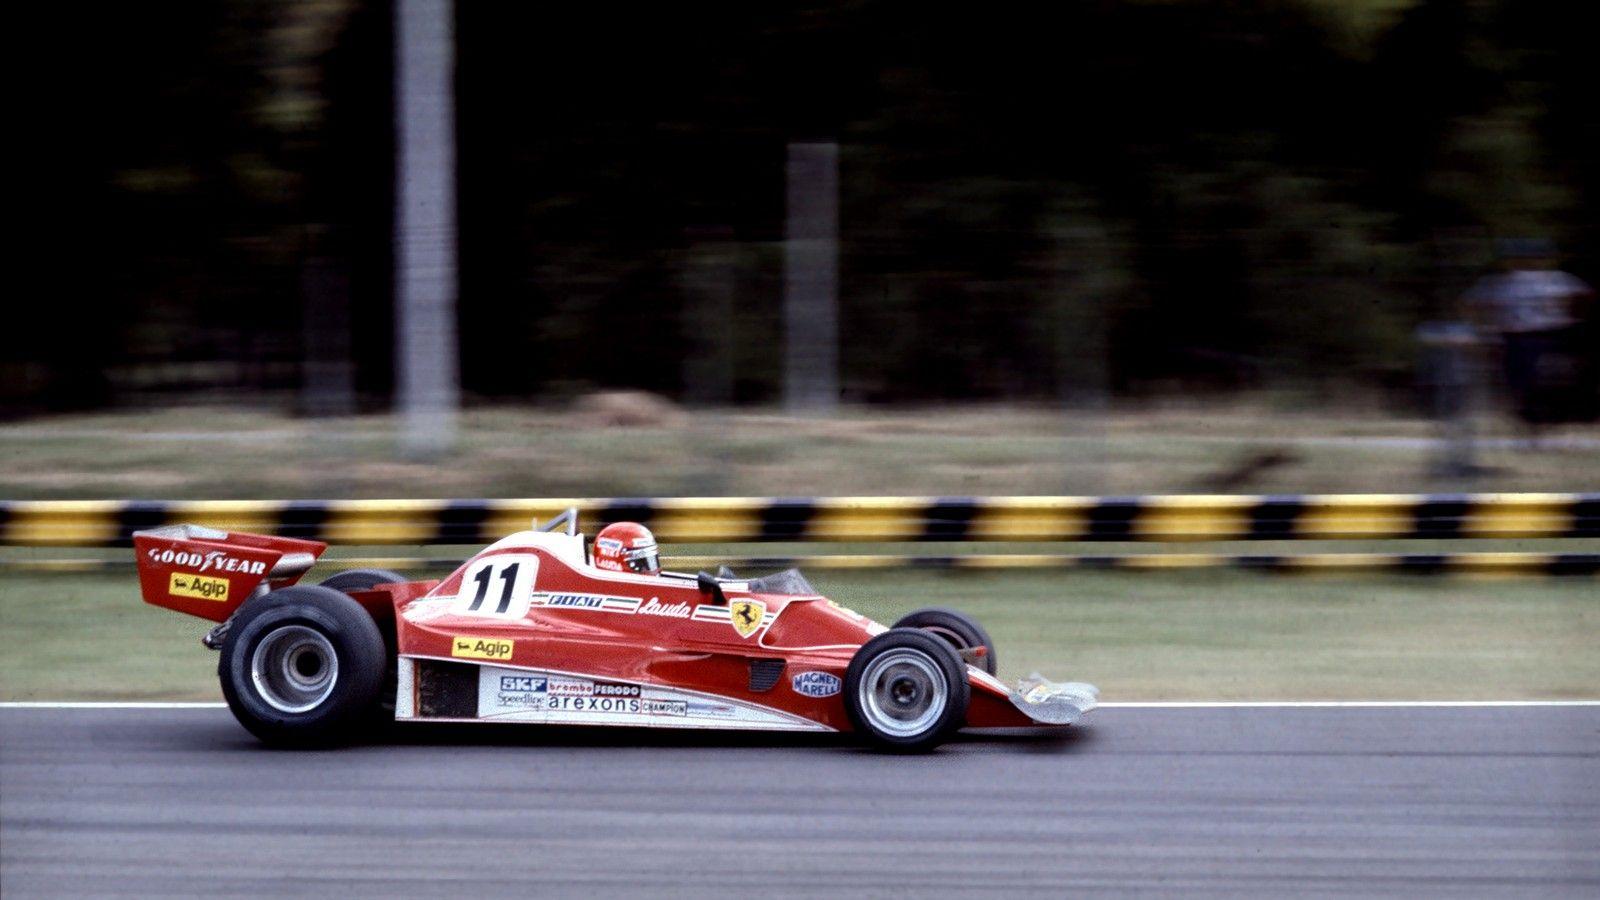 In 1977 Ferrari used the 312 T2 again. The car had already lost in ...